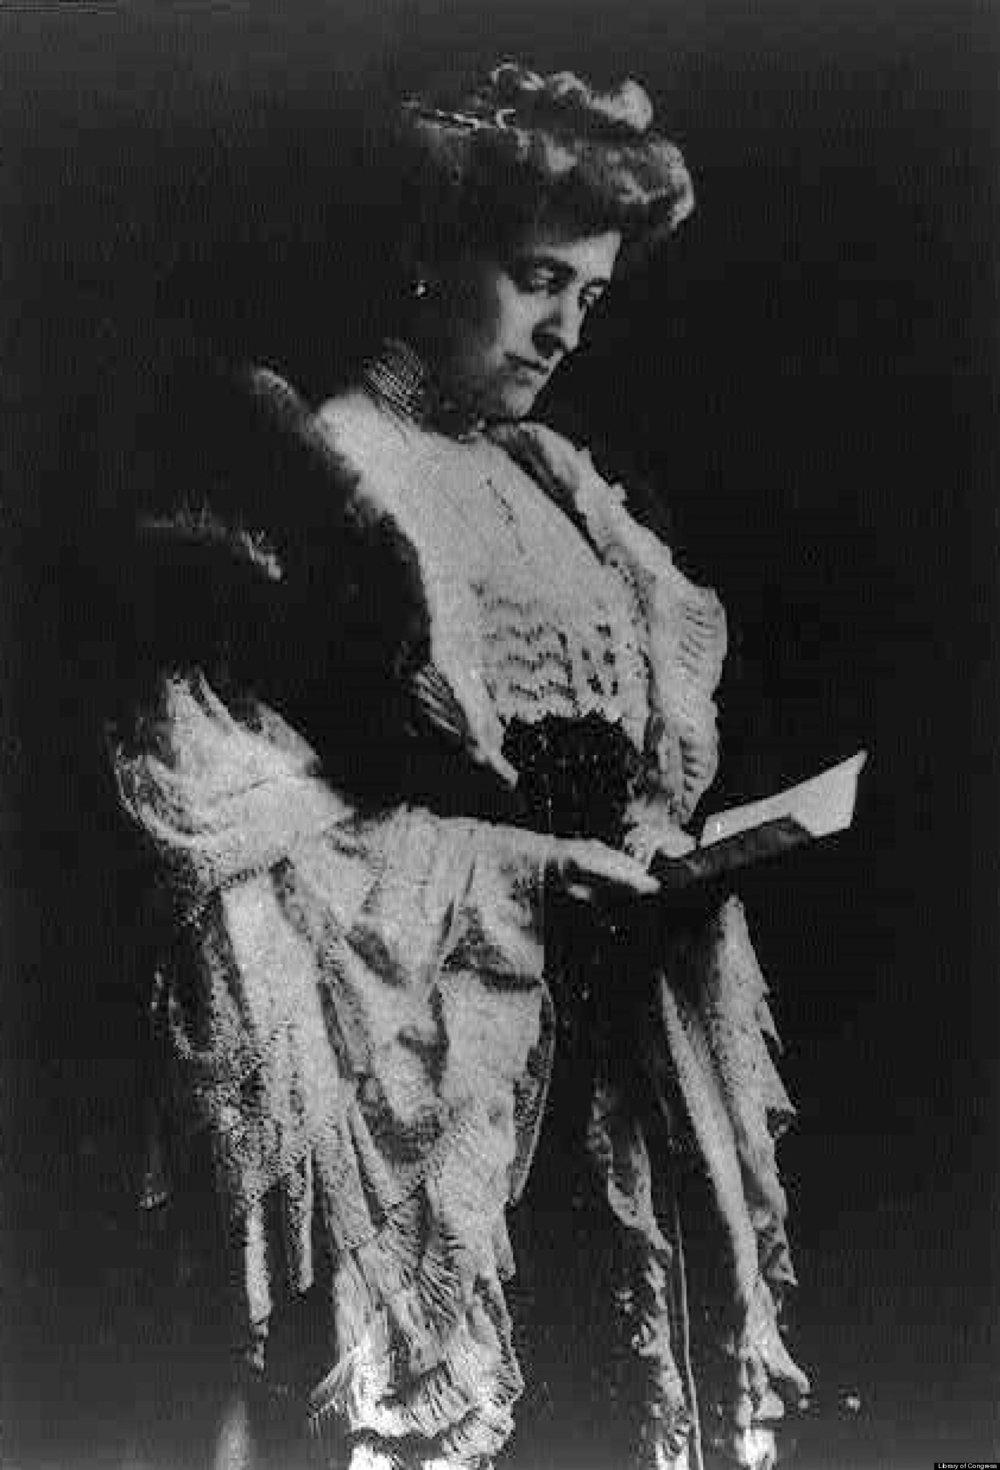 The lady herself, Edith Wharton.